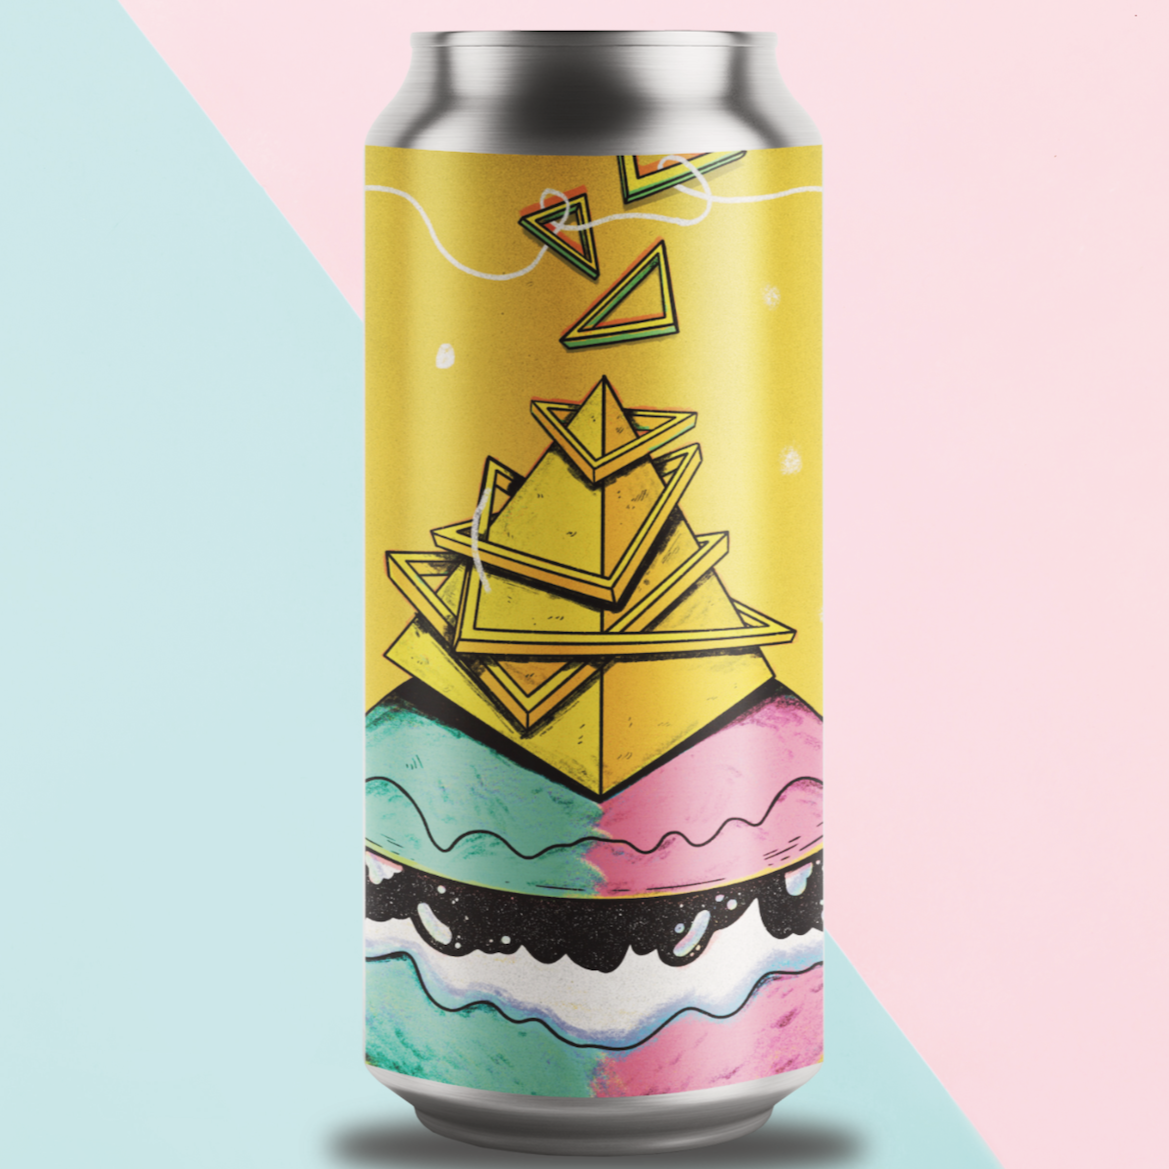 Left Handed Giant Brewing - Spiralling Prism